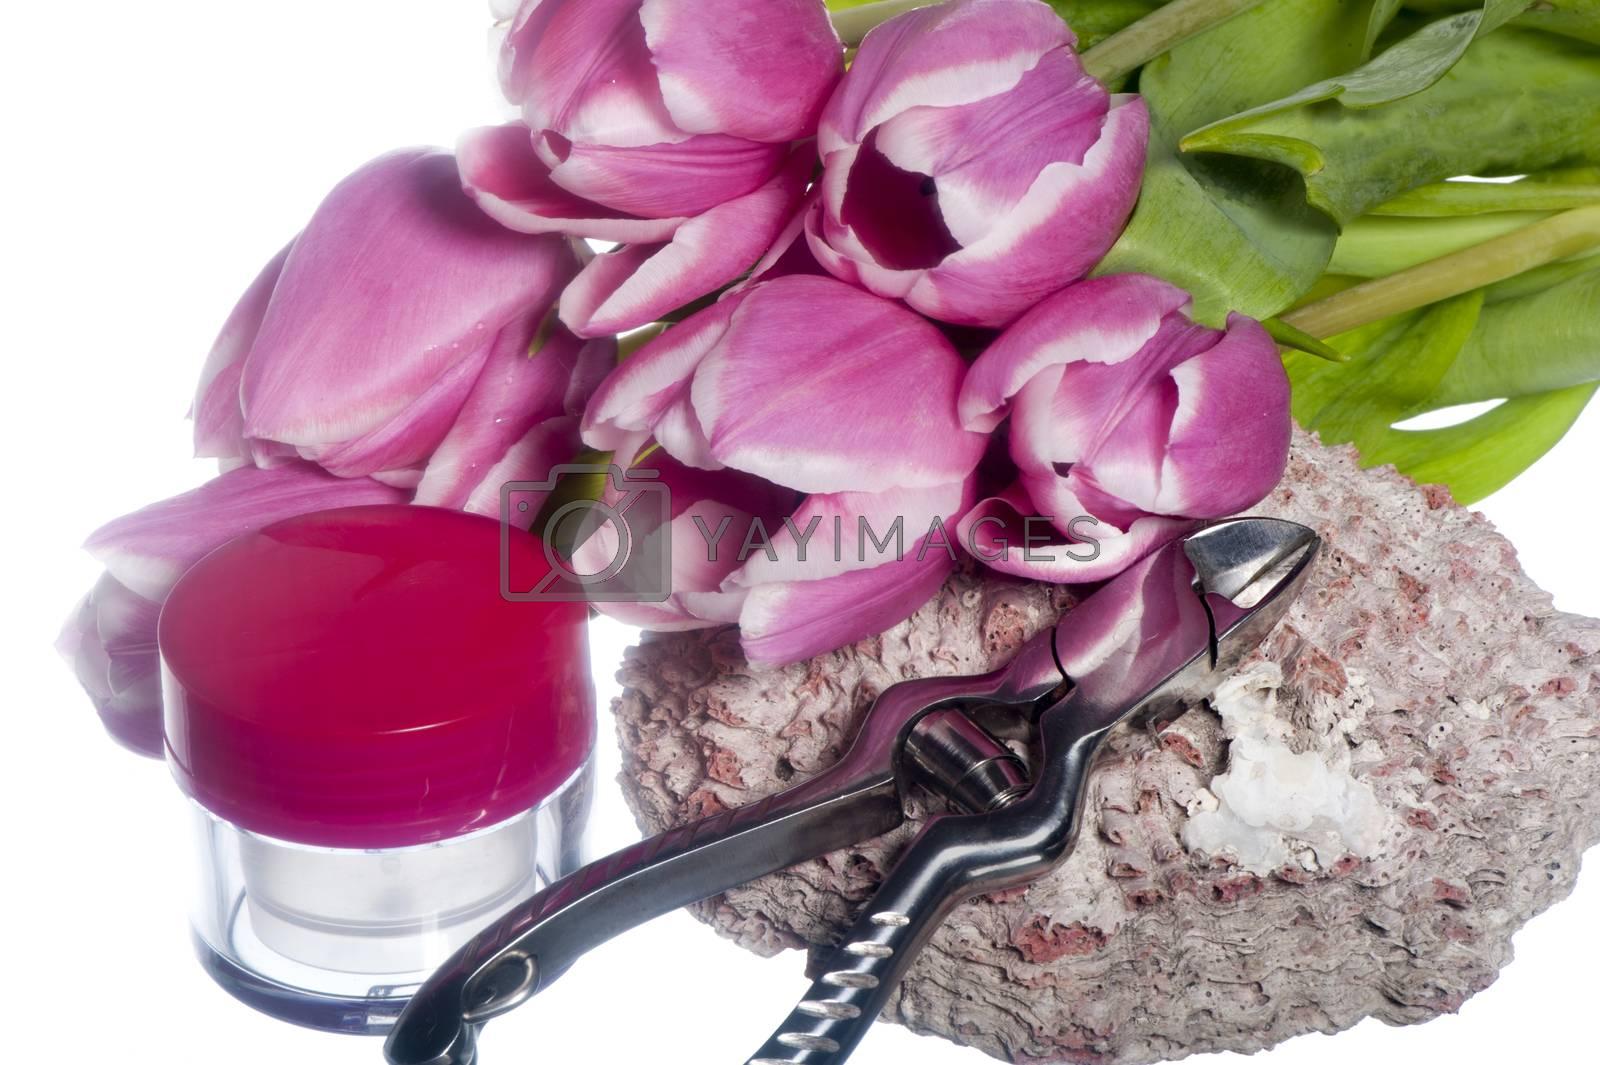 manicure  by carla720